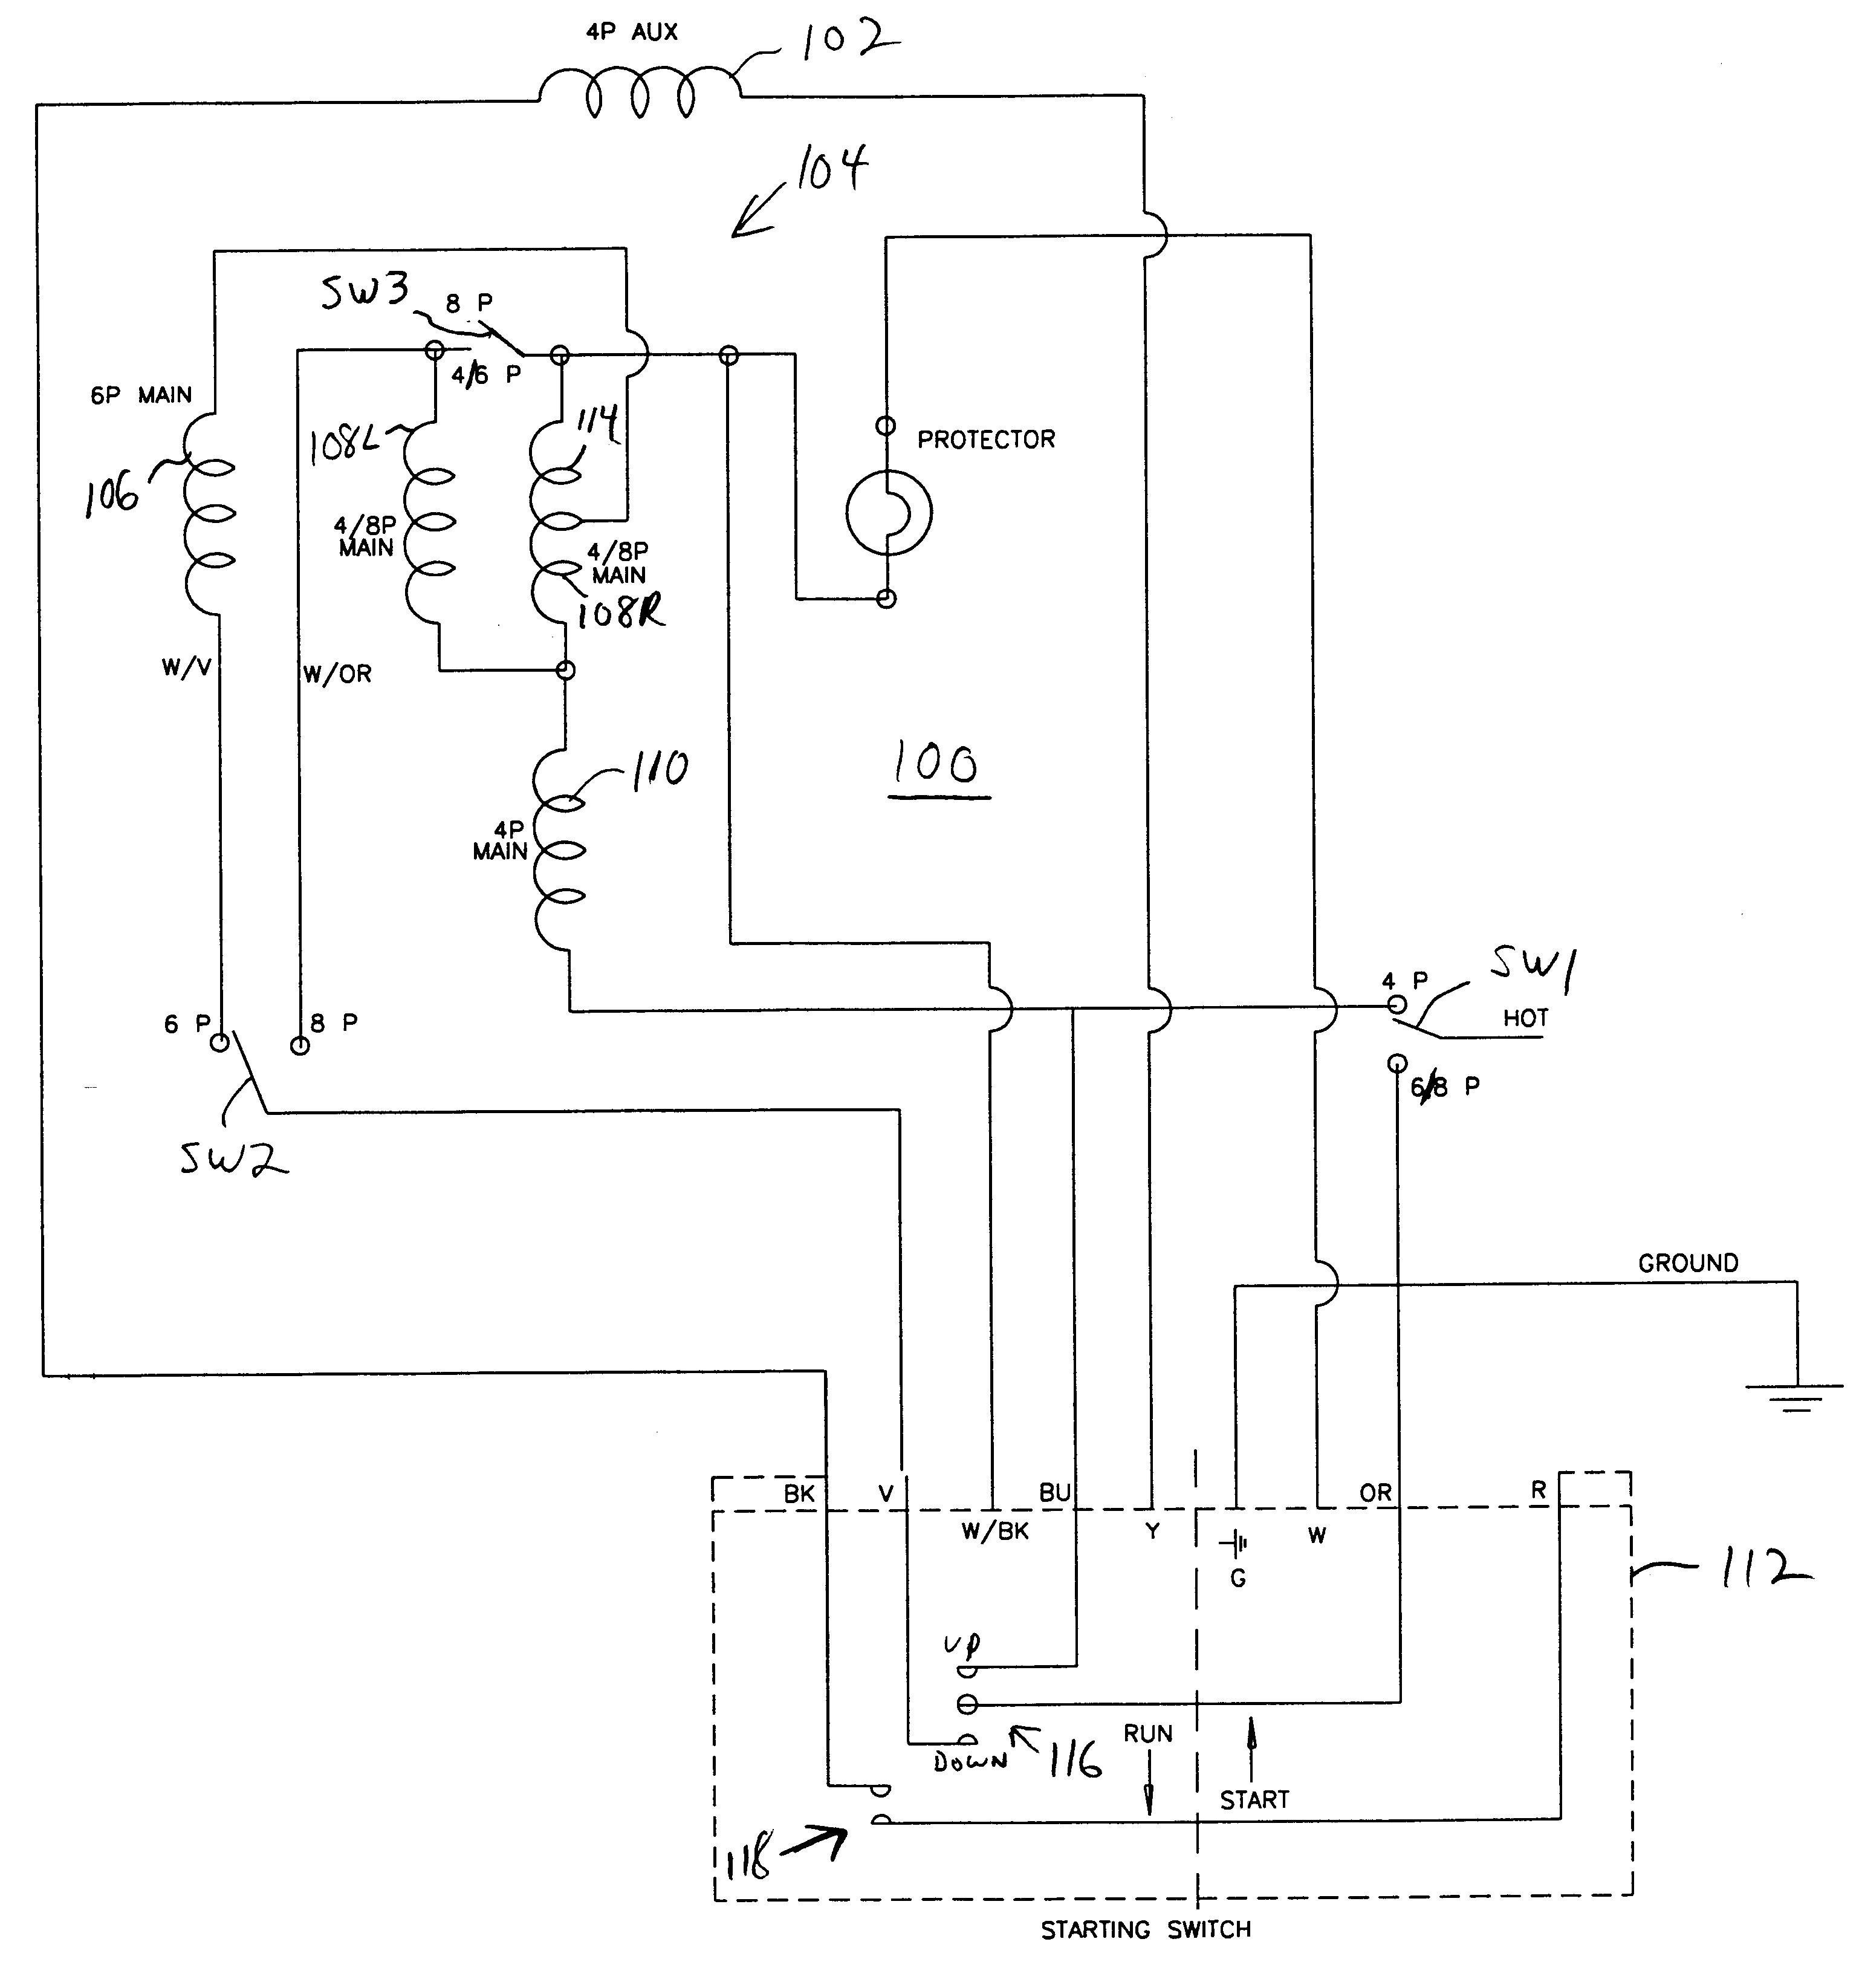 3 Phase Motor Wiring Diagram Luxury 3 Wire Condenser Fan Motor Wiring Diagram Diagram Of 3 Phase Motor Wiring Diagram